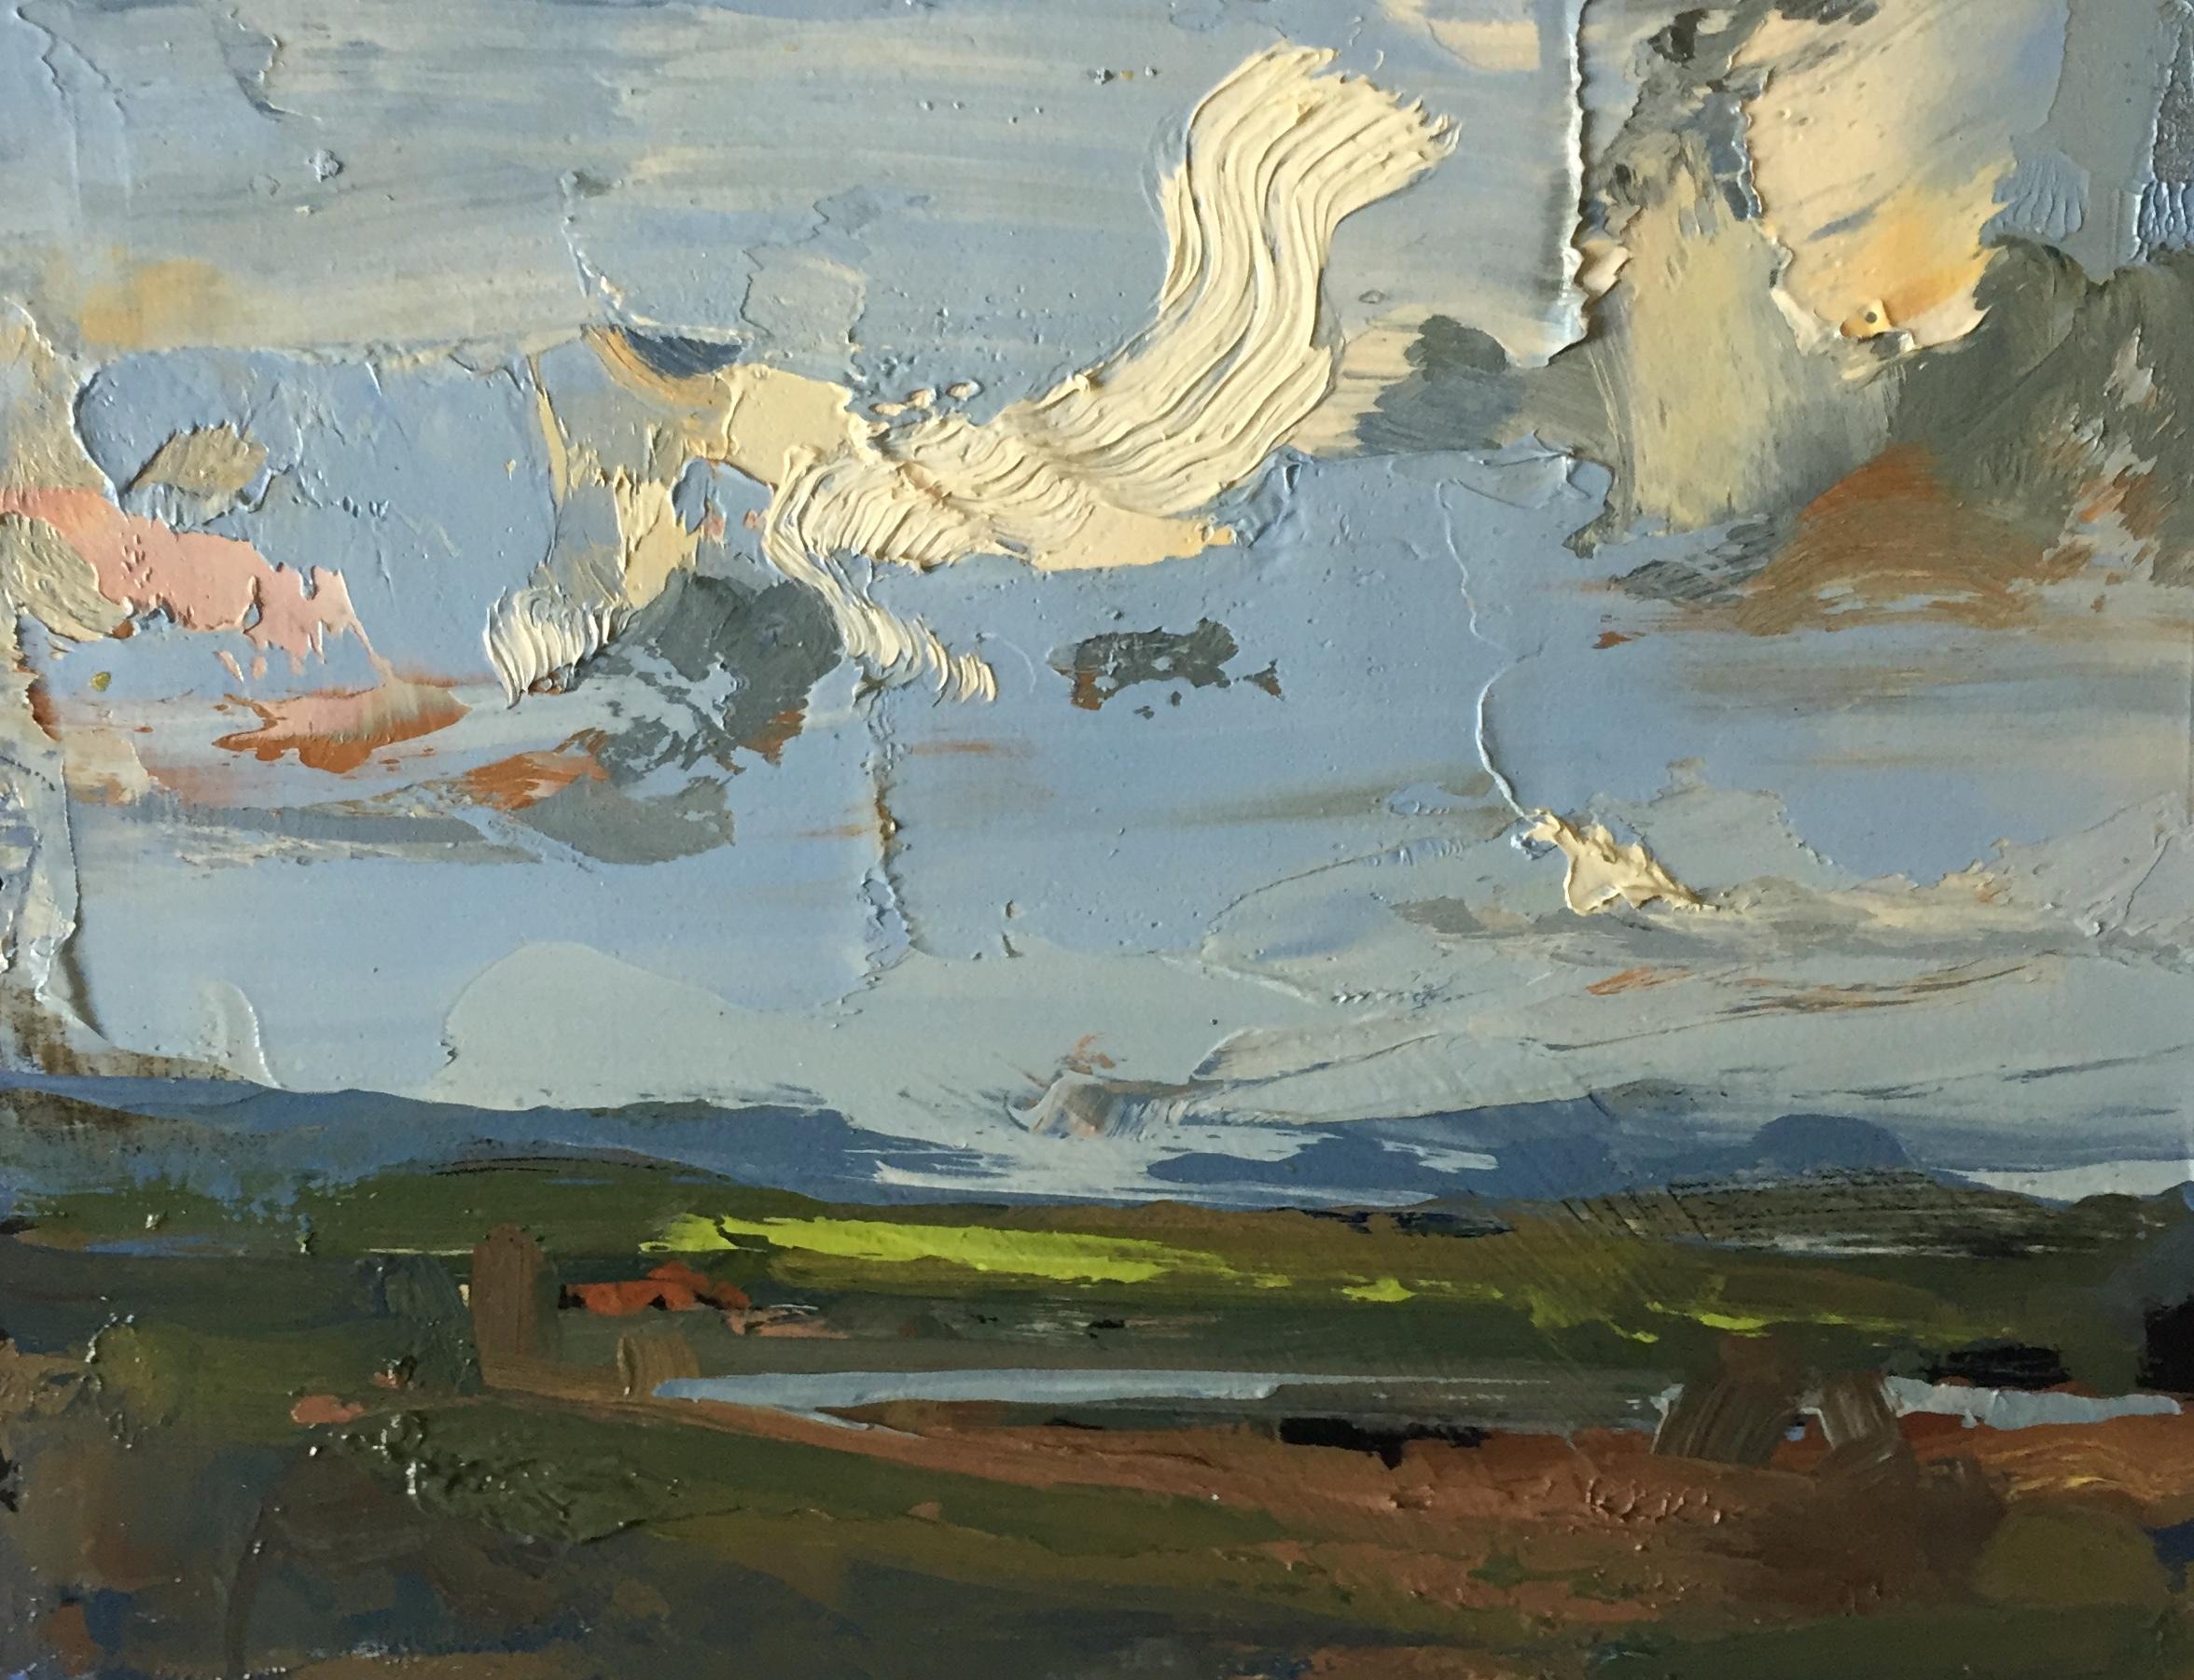 'Cloud Study', oil on panel, 18cm x 23cm, £1800